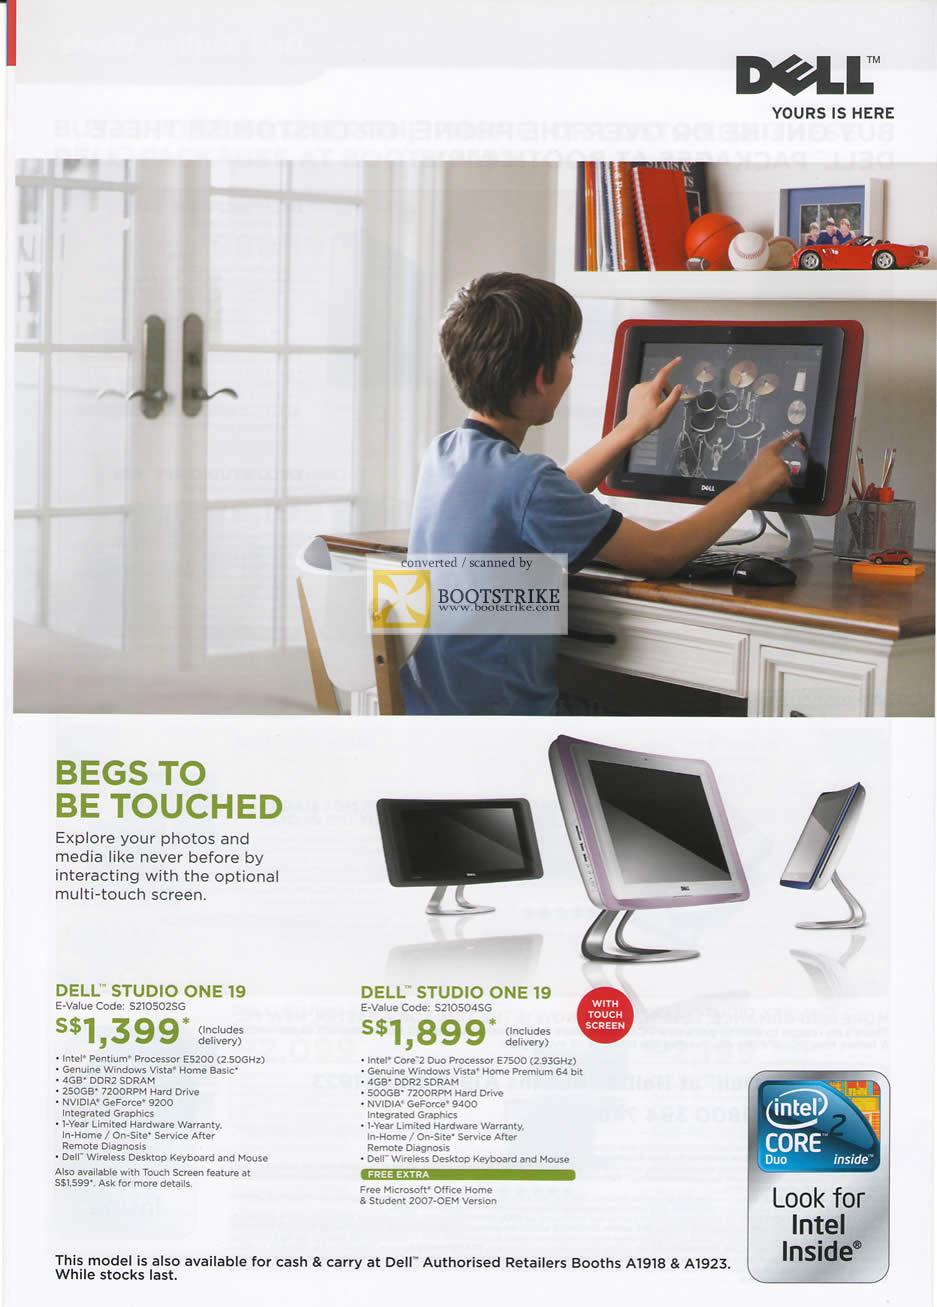 PC Show 2009 price list image brochure of Dell Studio One 19 Desktops